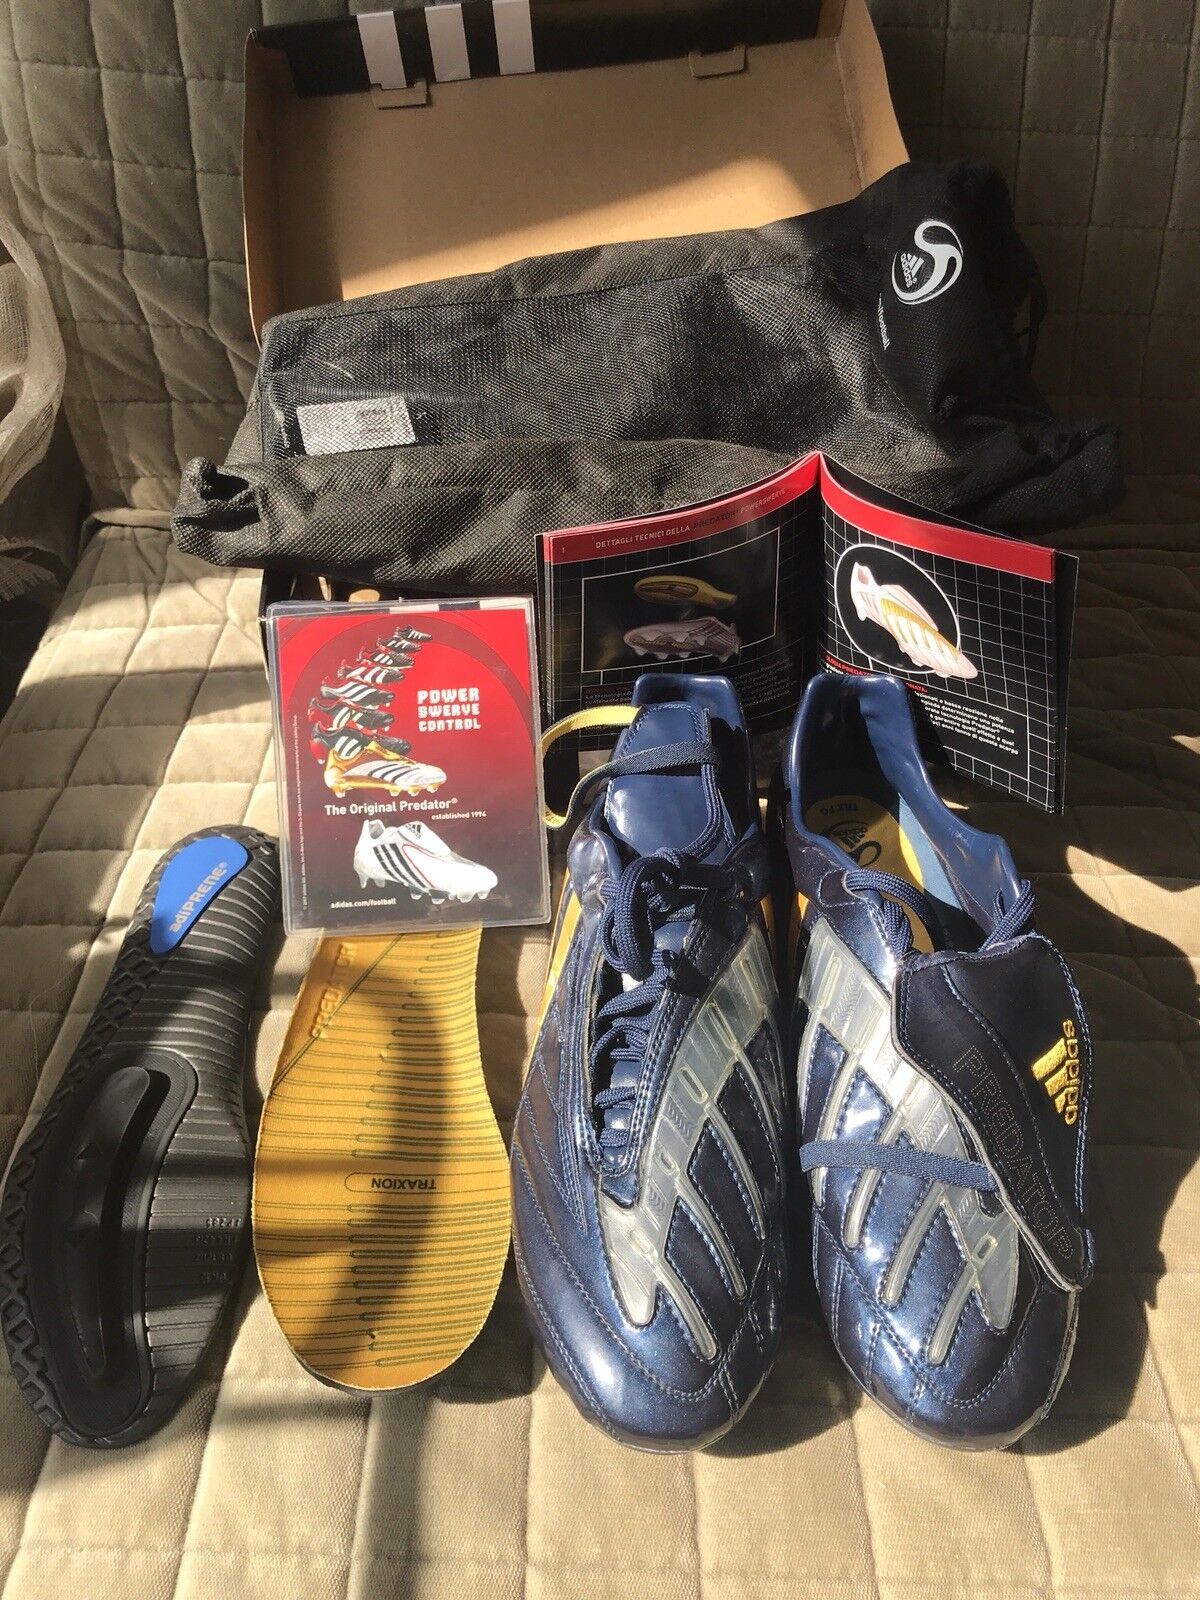 Adidas Prossoator energiaswerve TRX FG Diuominiione 10.5 blu D Beckham edizione